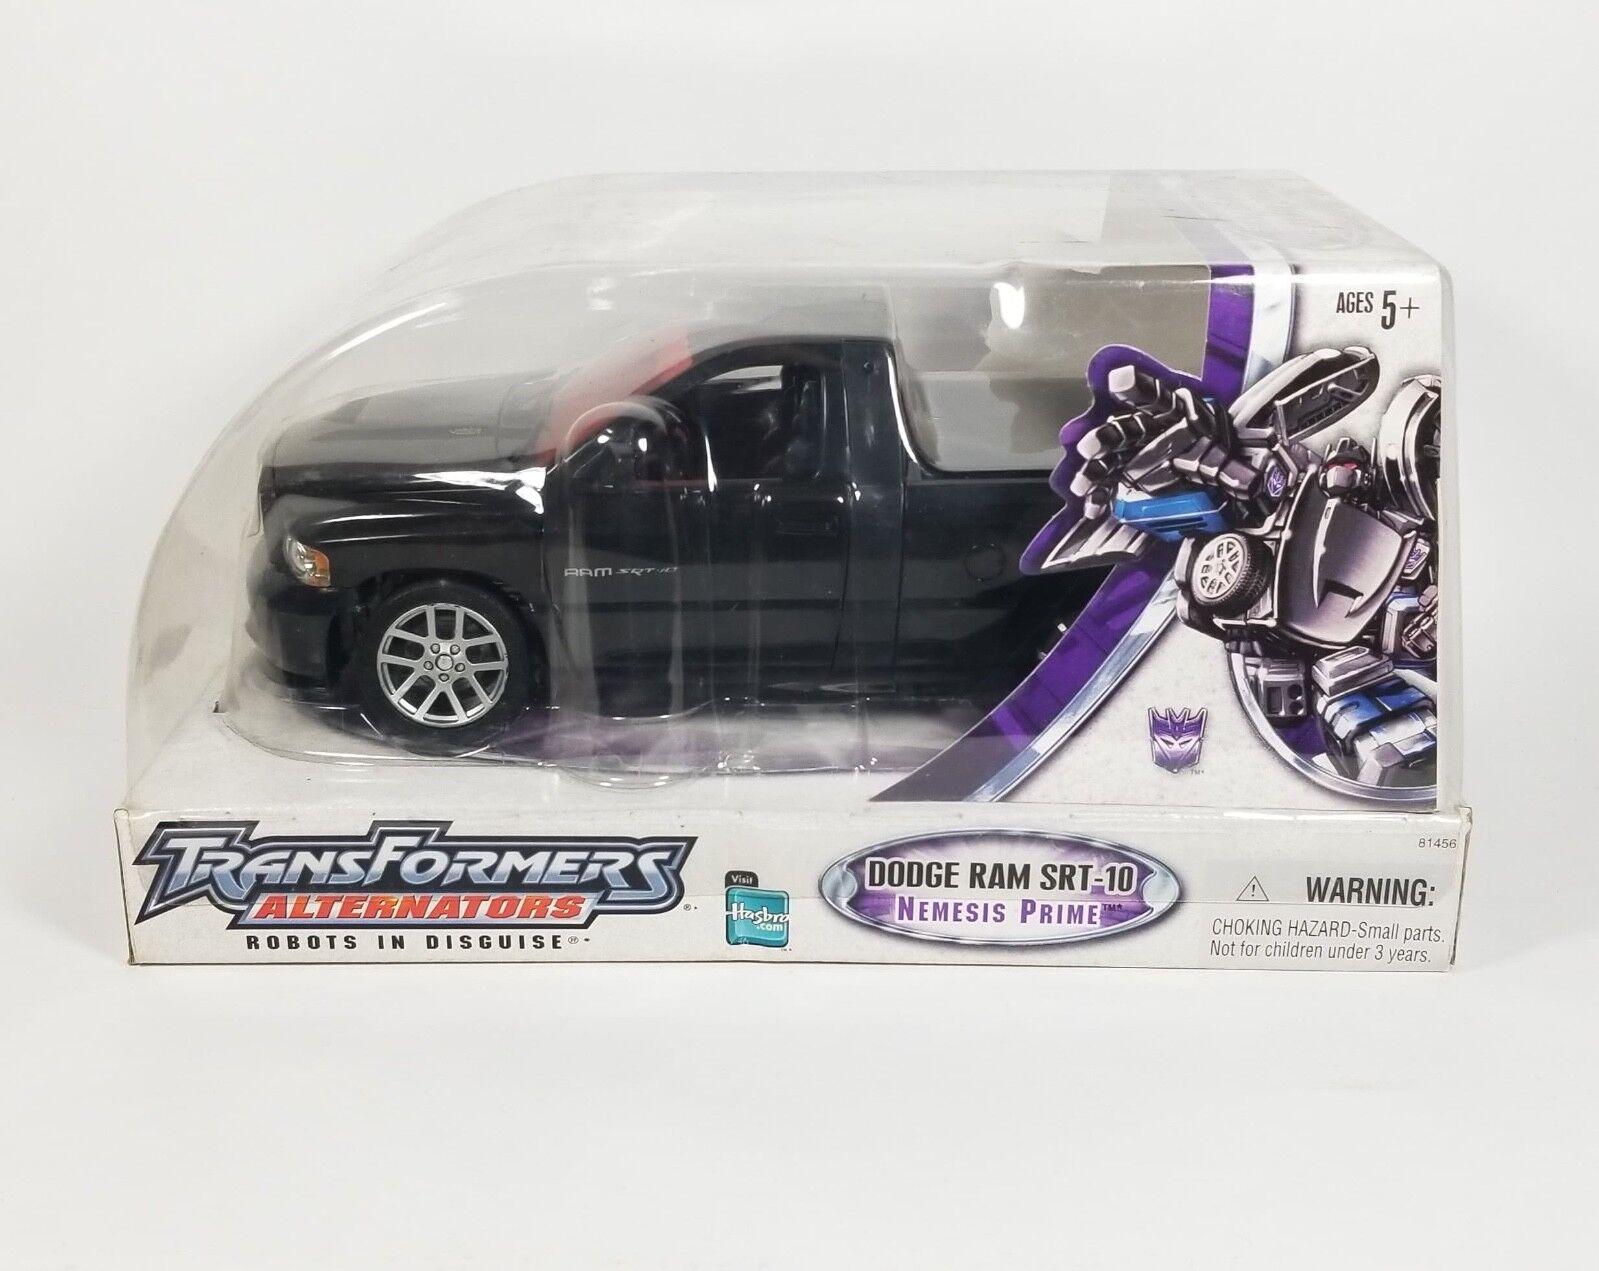 Transformers Alternators Nemesis Prime Sealed SDCC Exclusive With FACTORY ERROR